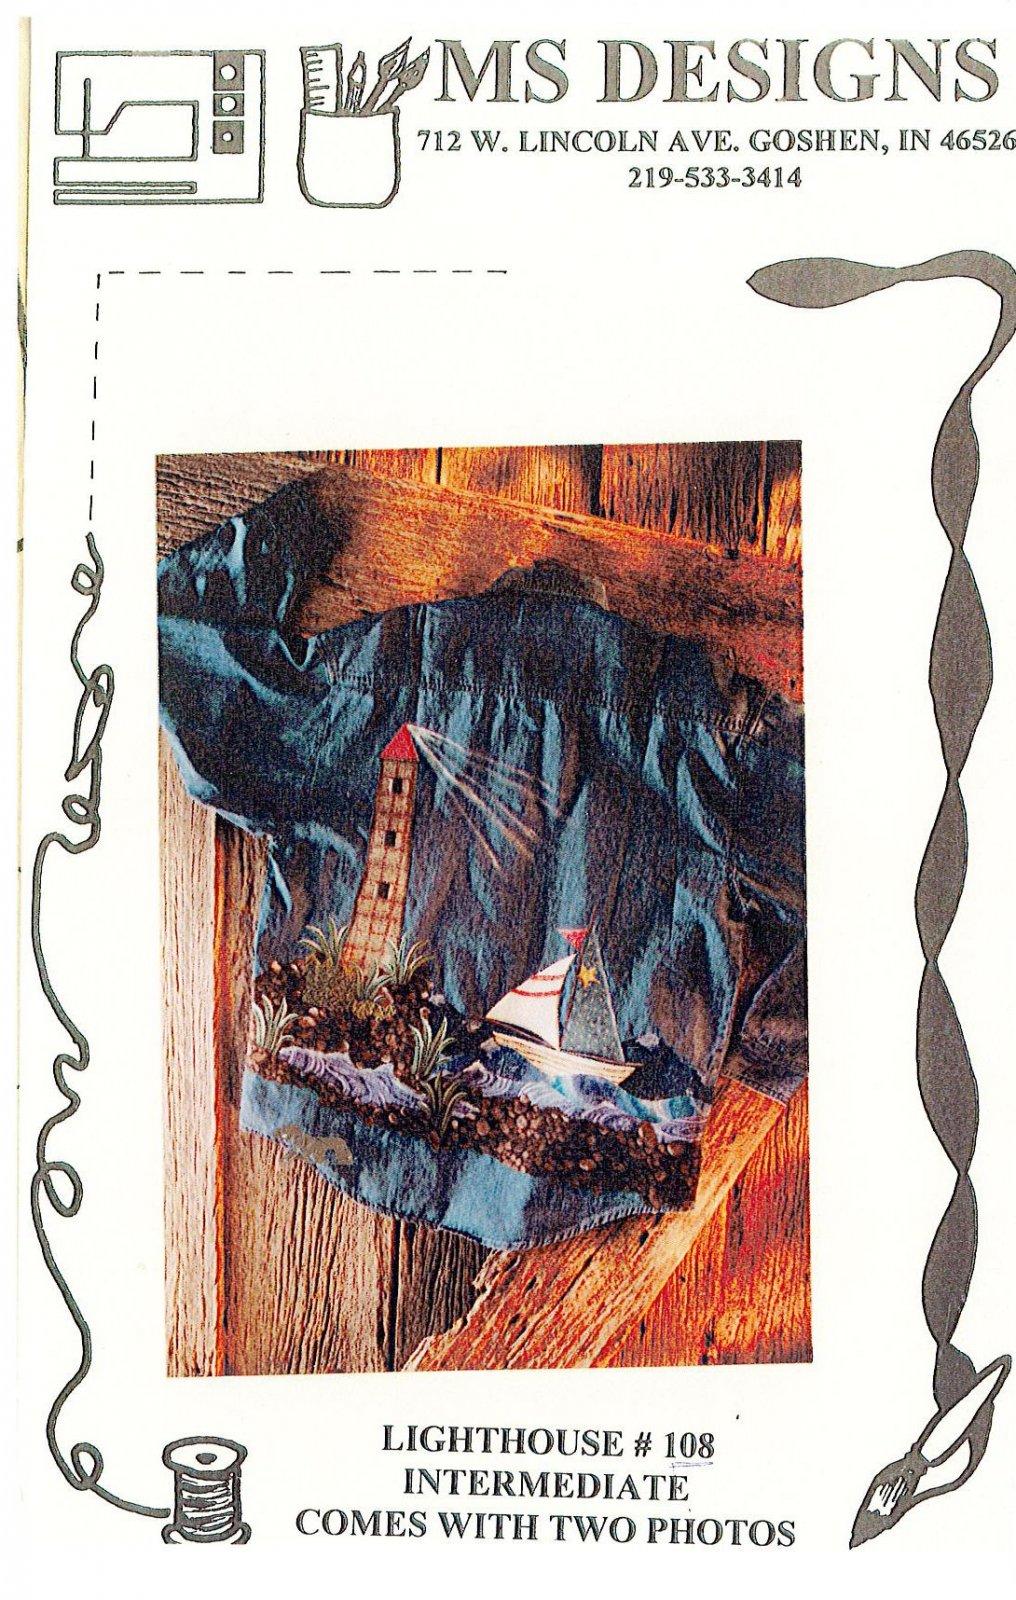 MS DESIGNS - Lighthouse #108